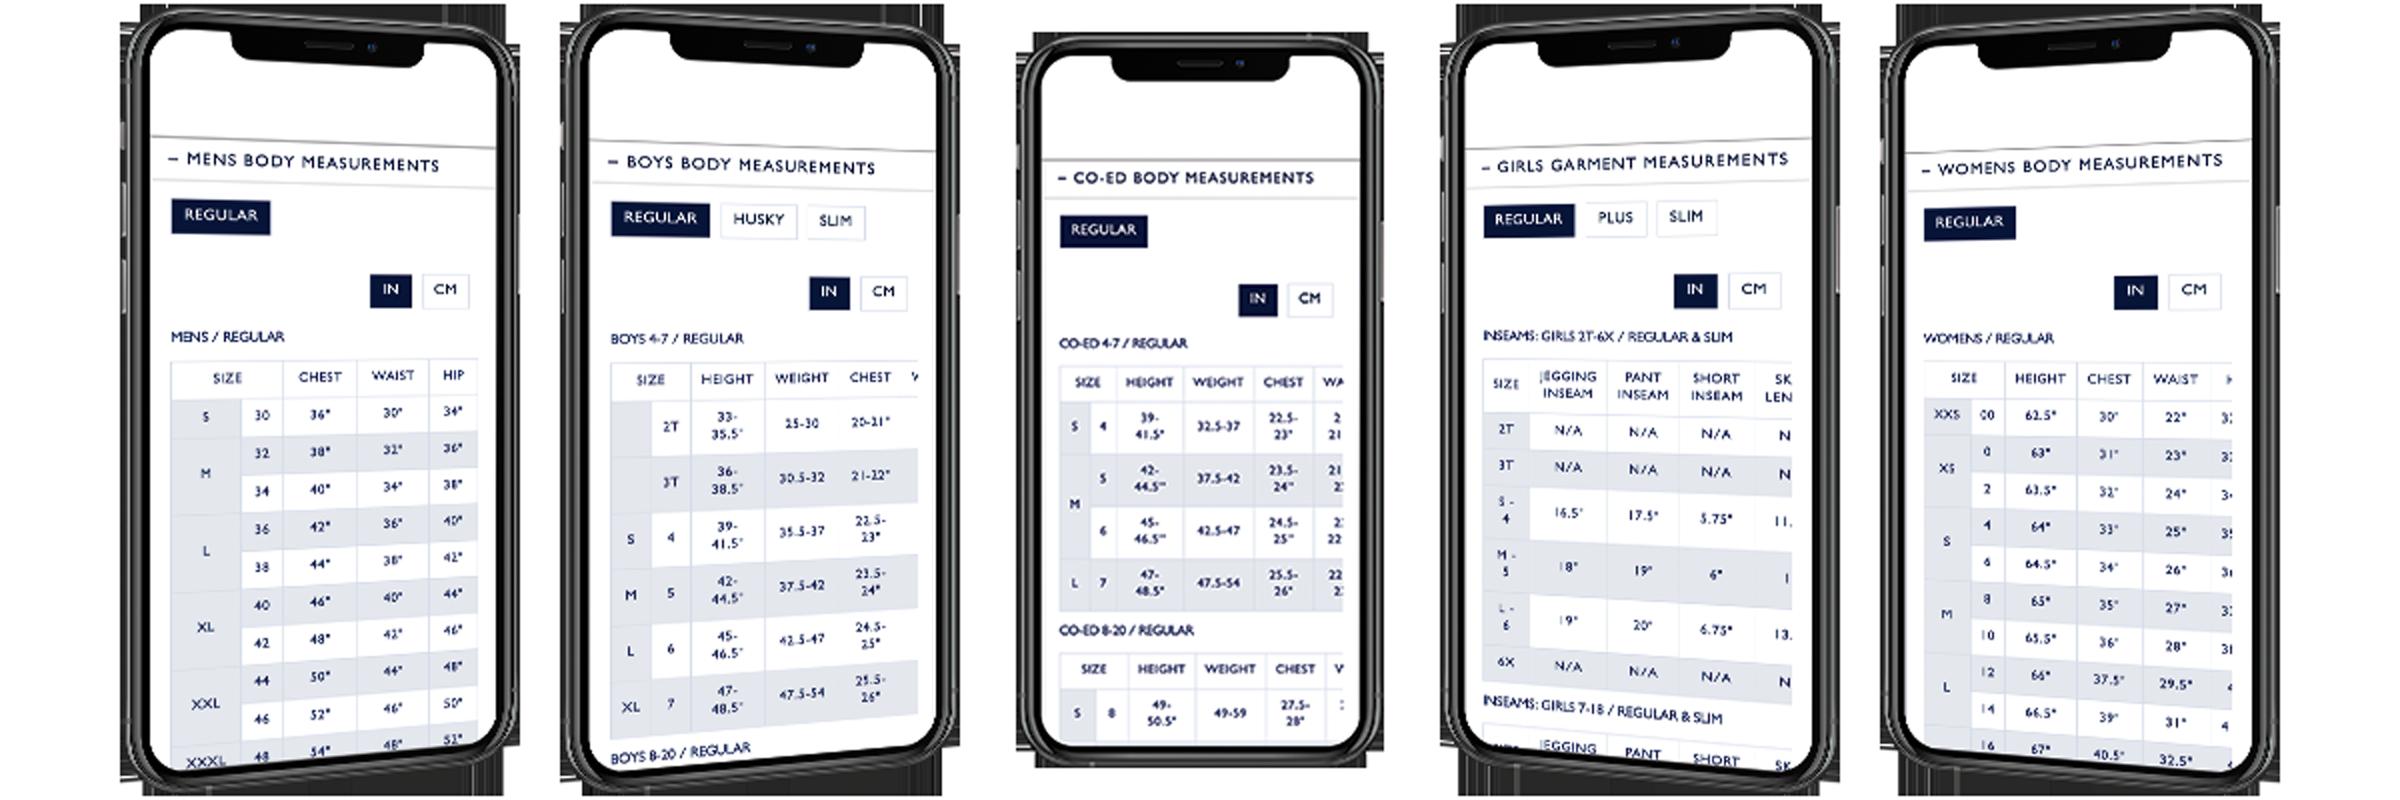 tommy-hilfiger-size-charts-mobile-mockup-2